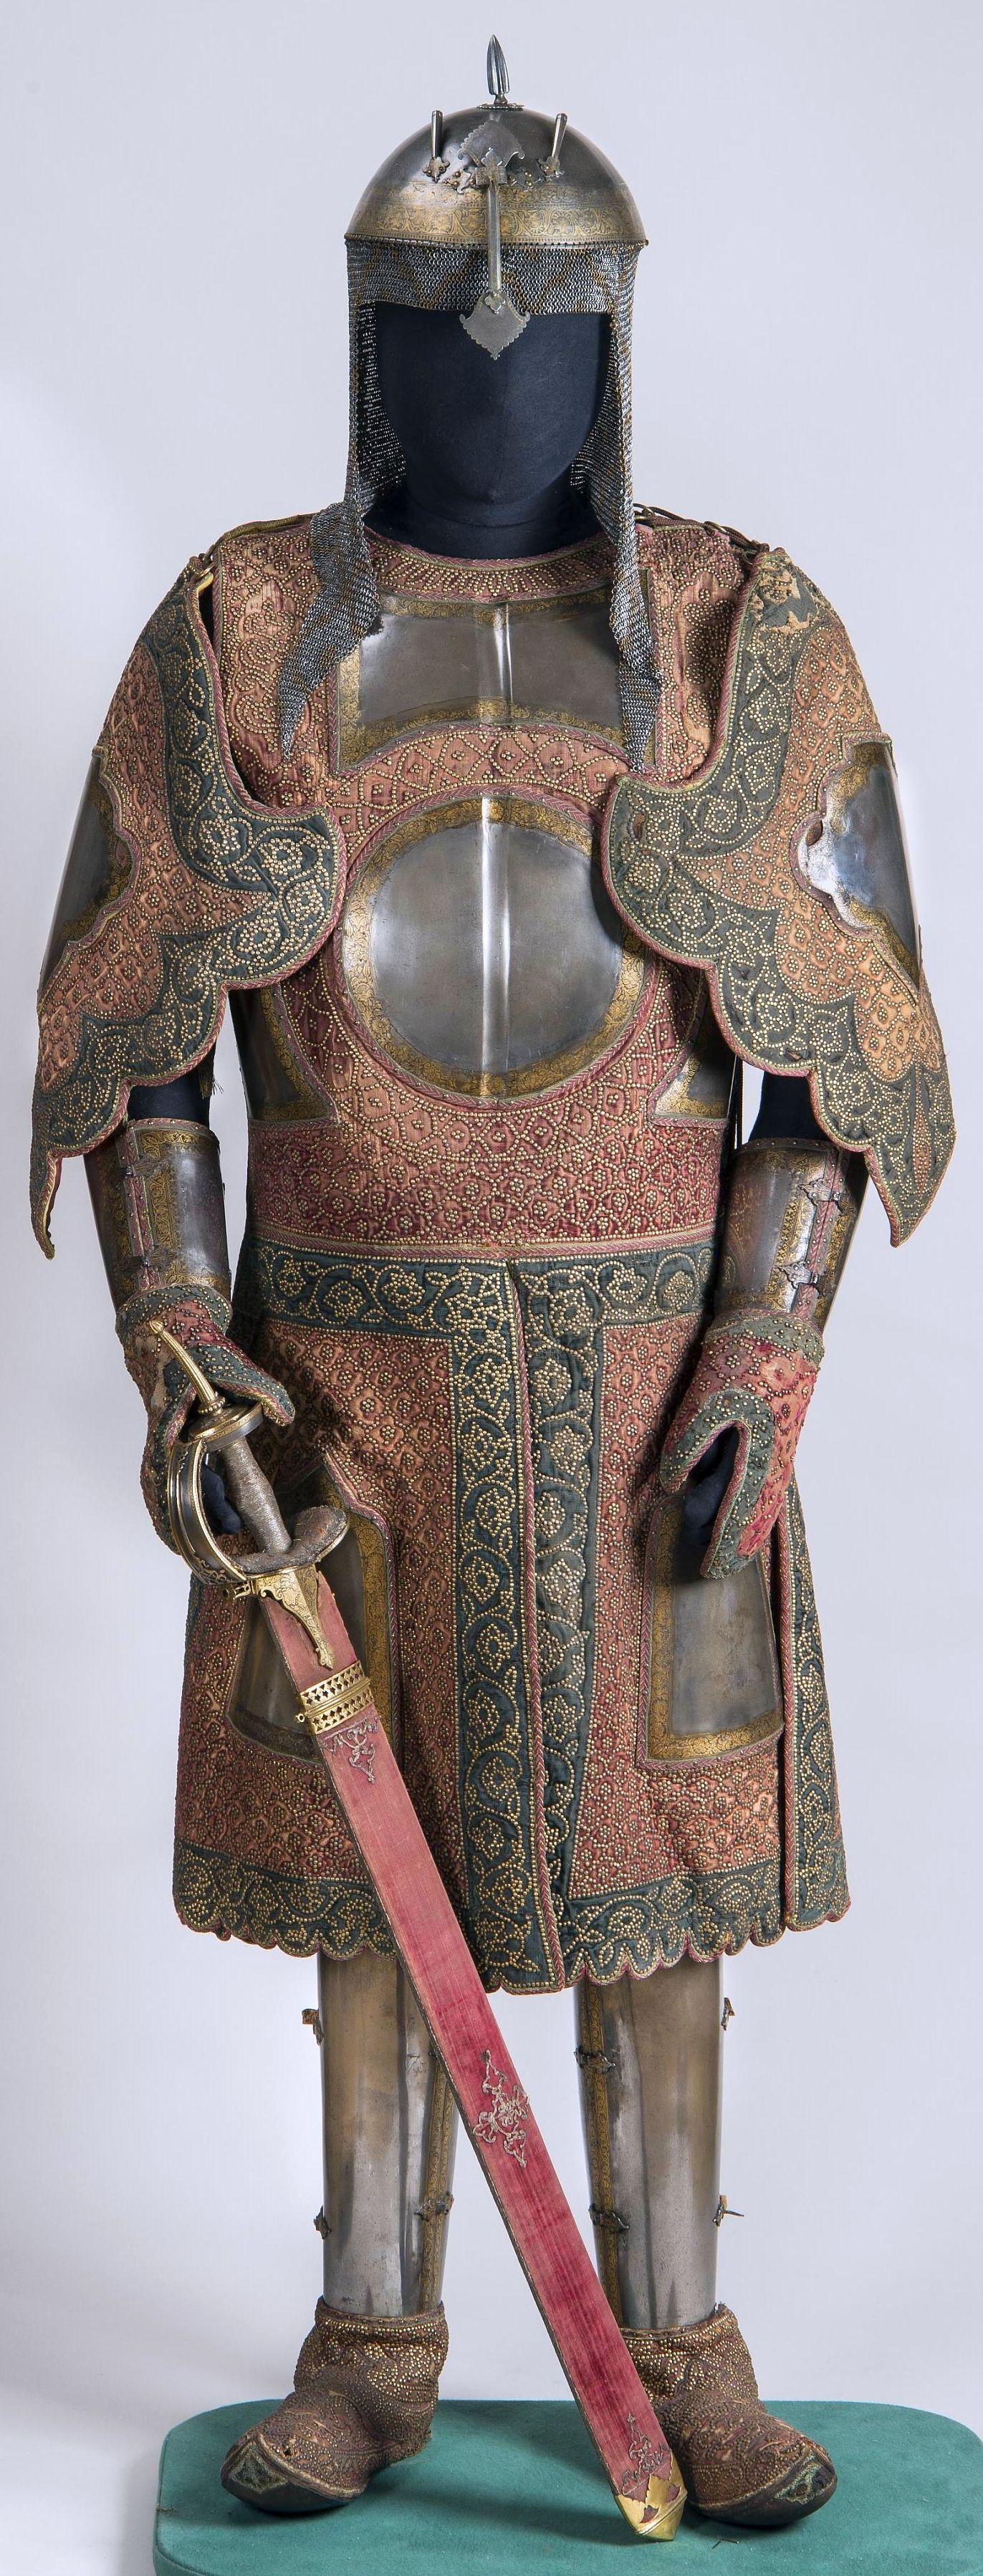 Chilta hazar masha (coat of a thousand nails), kulah khud